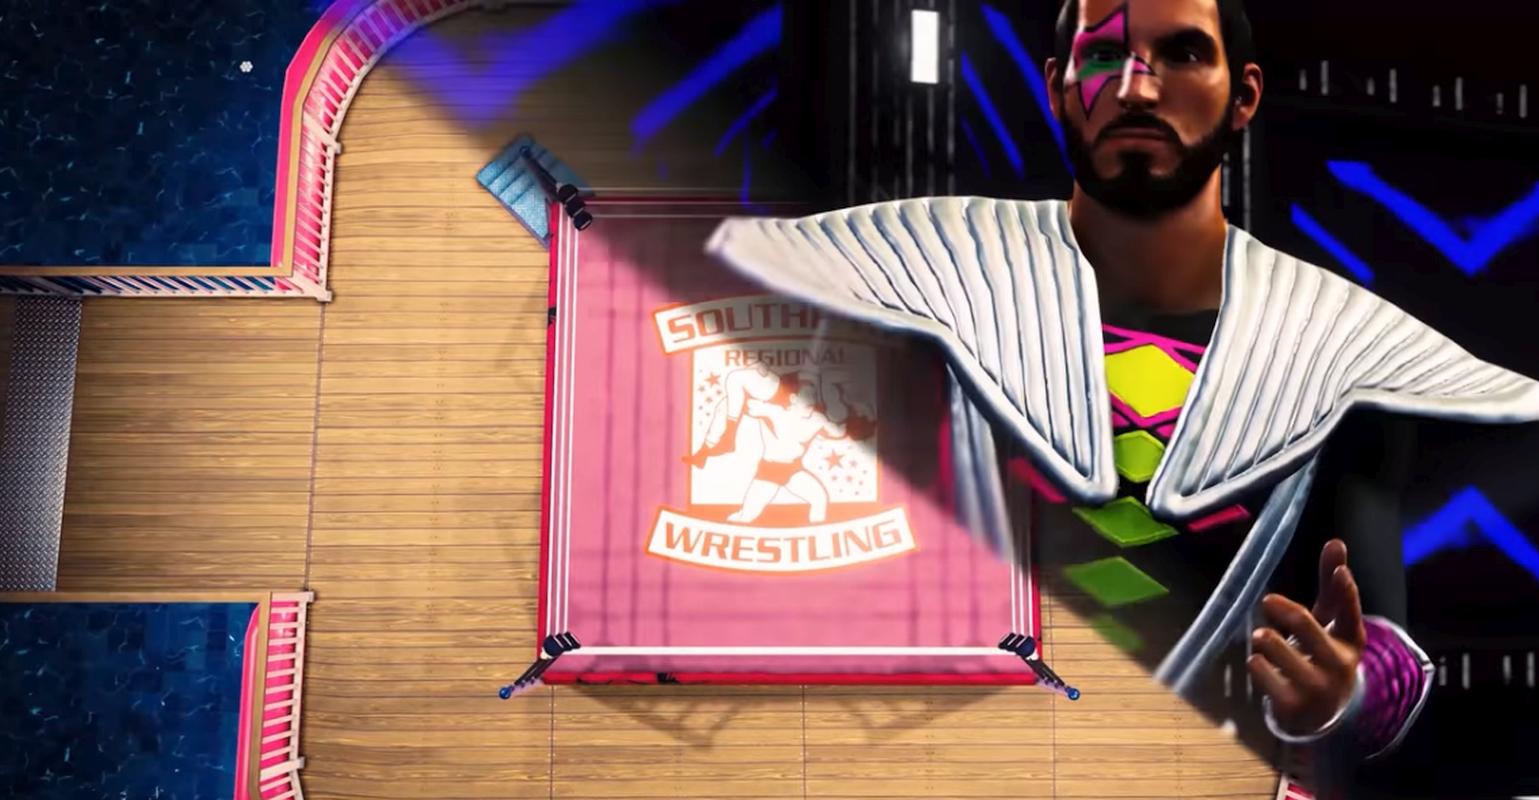 WWE 2K20 Releases Patch 1.07 Plus Southpaw Regional Wrestling DLC